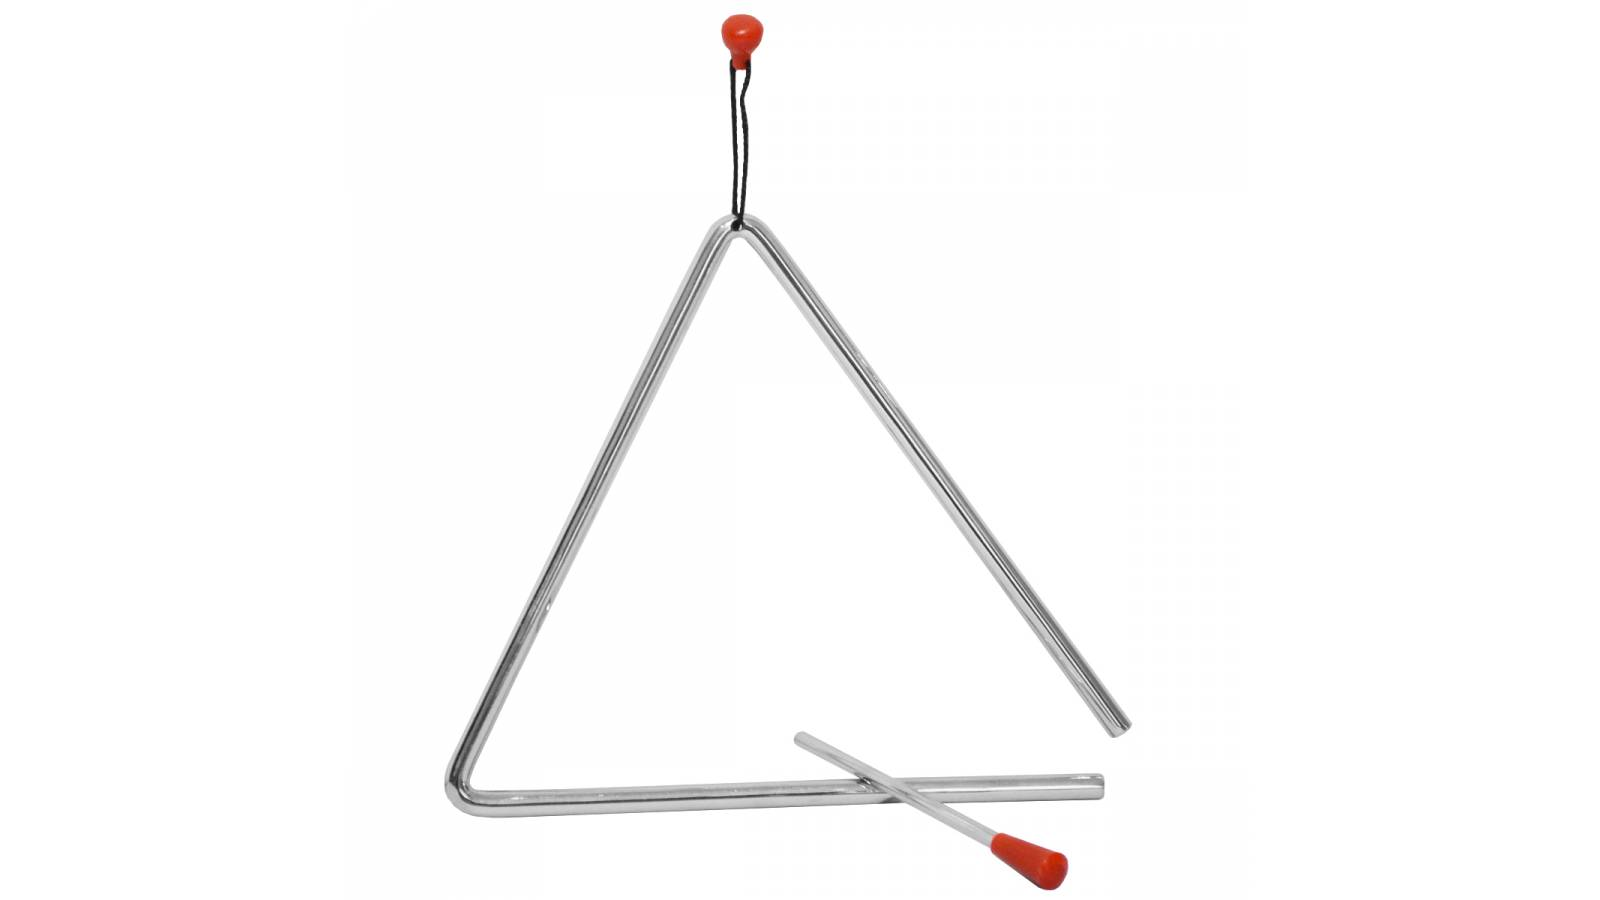 "Triángulo de 7"" Instrumento Musical de Percusión Fever"